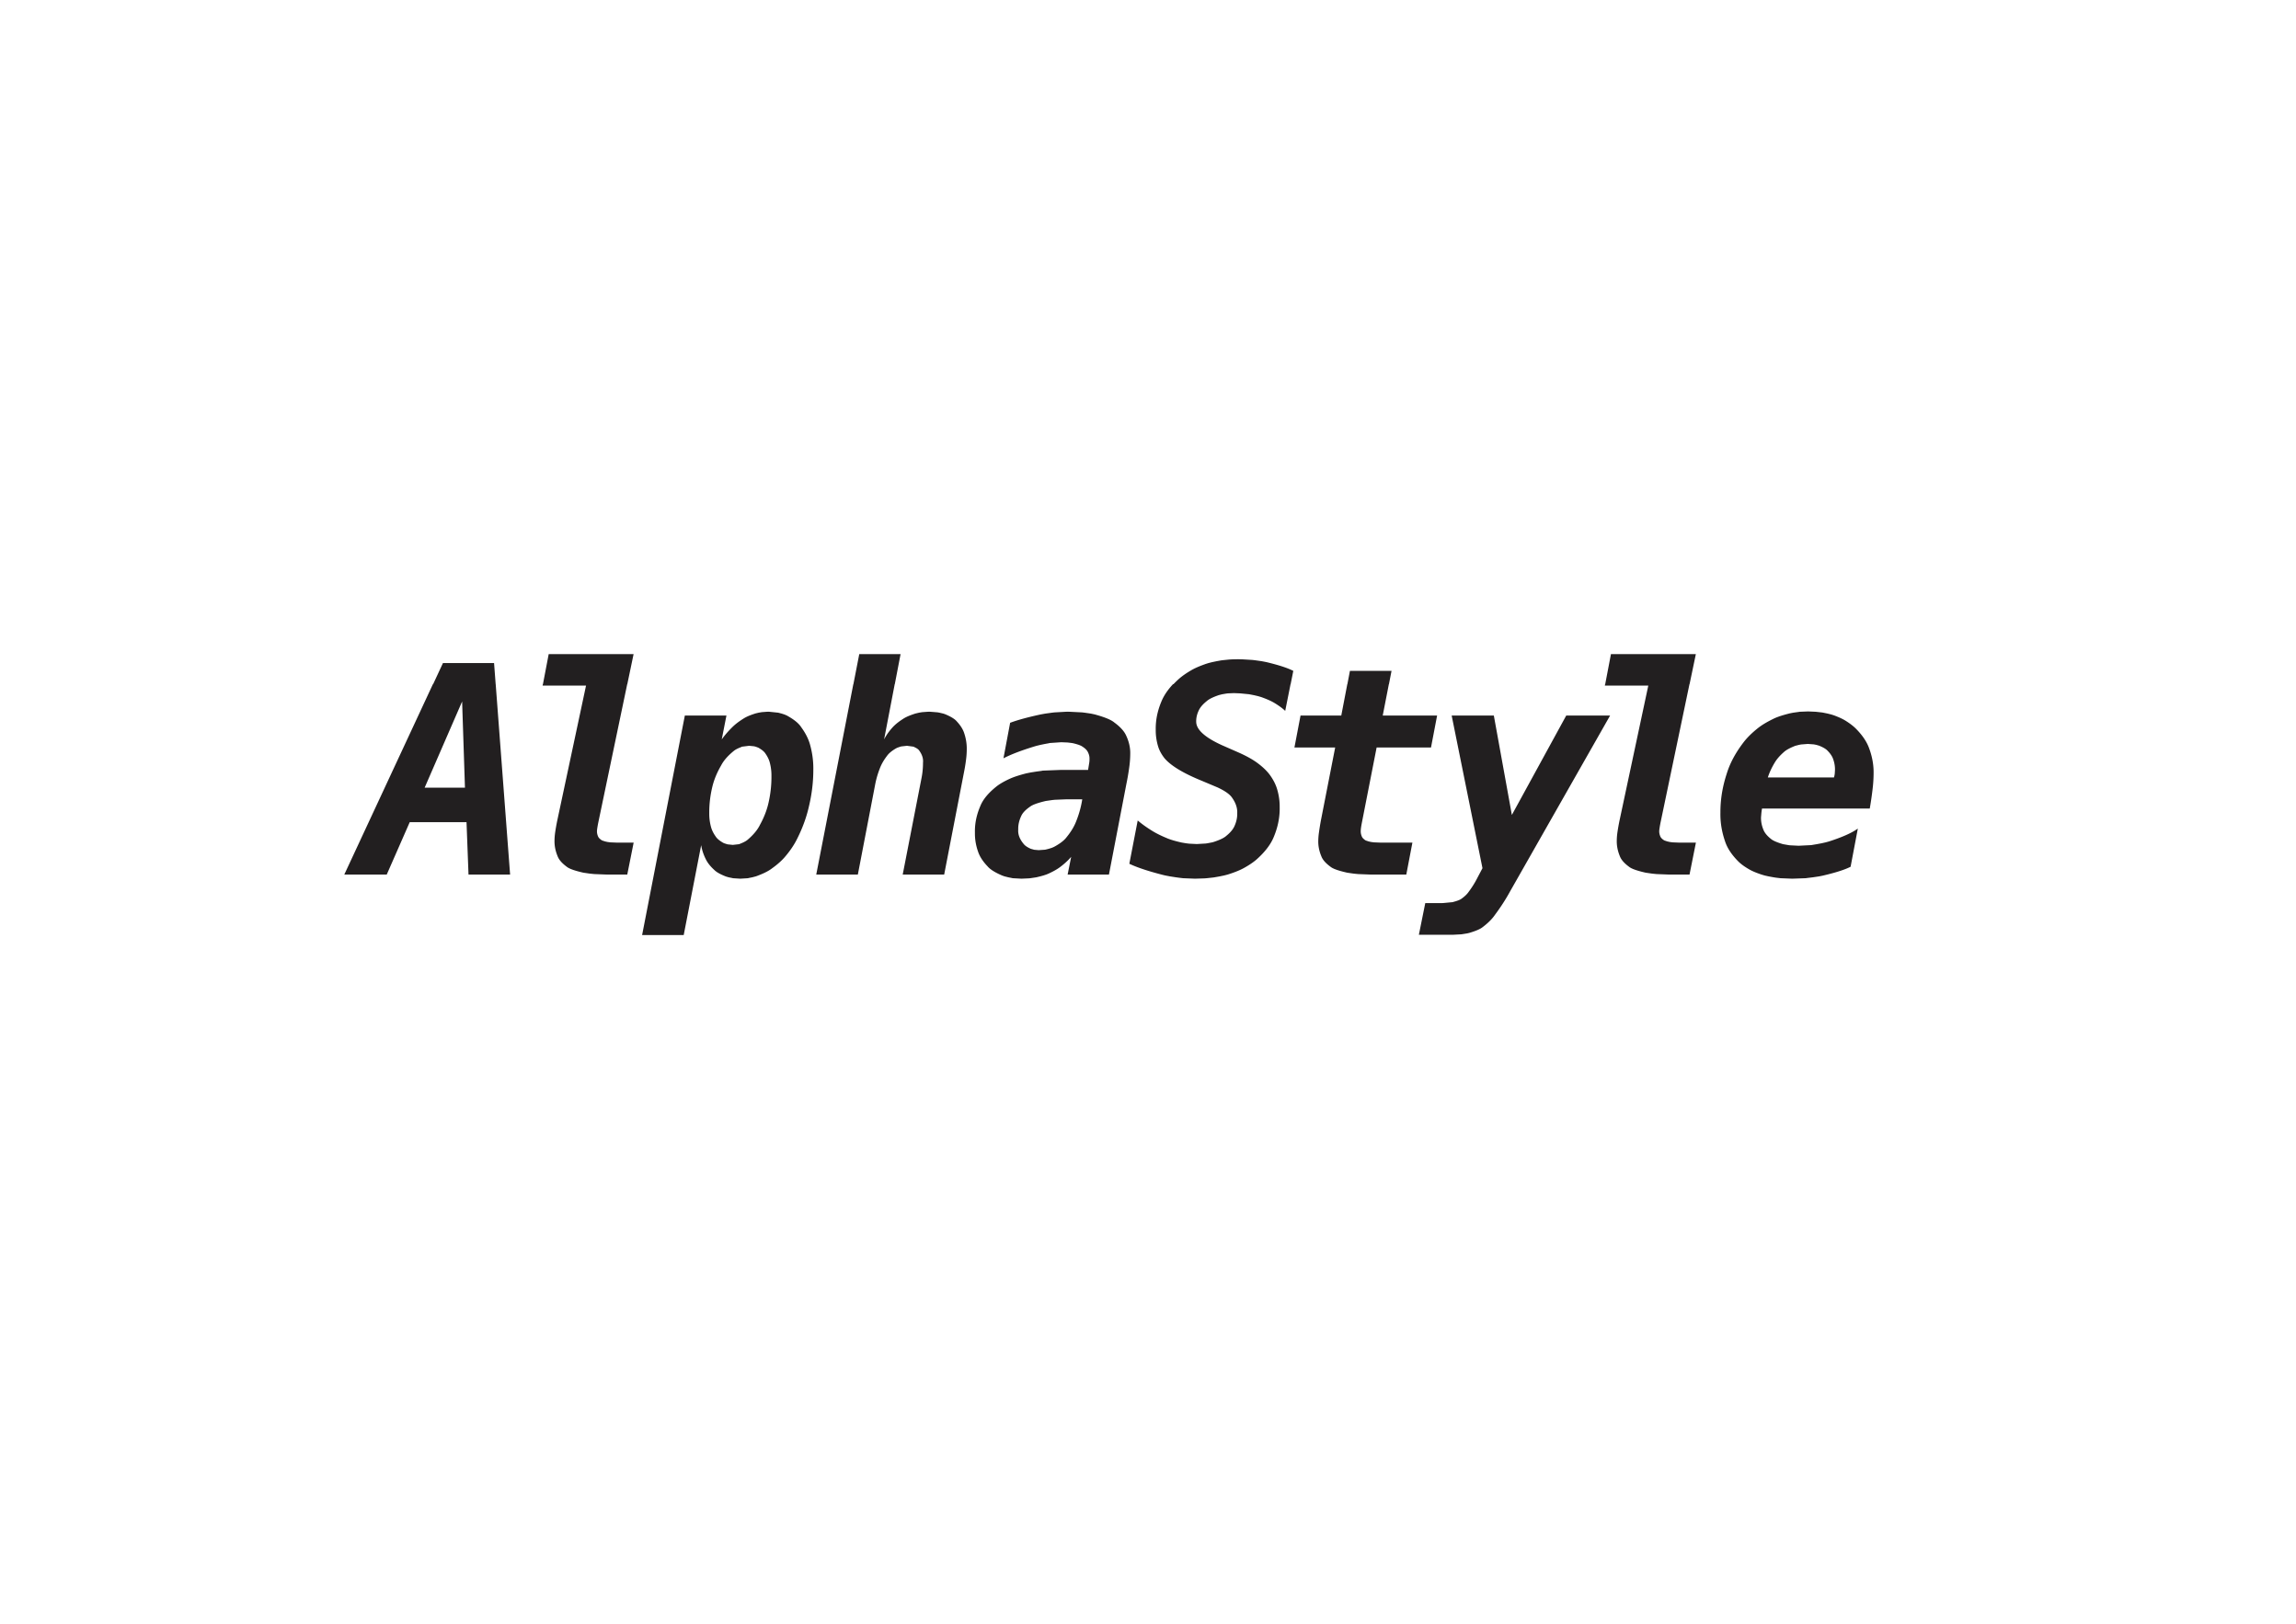 AlphaStyle